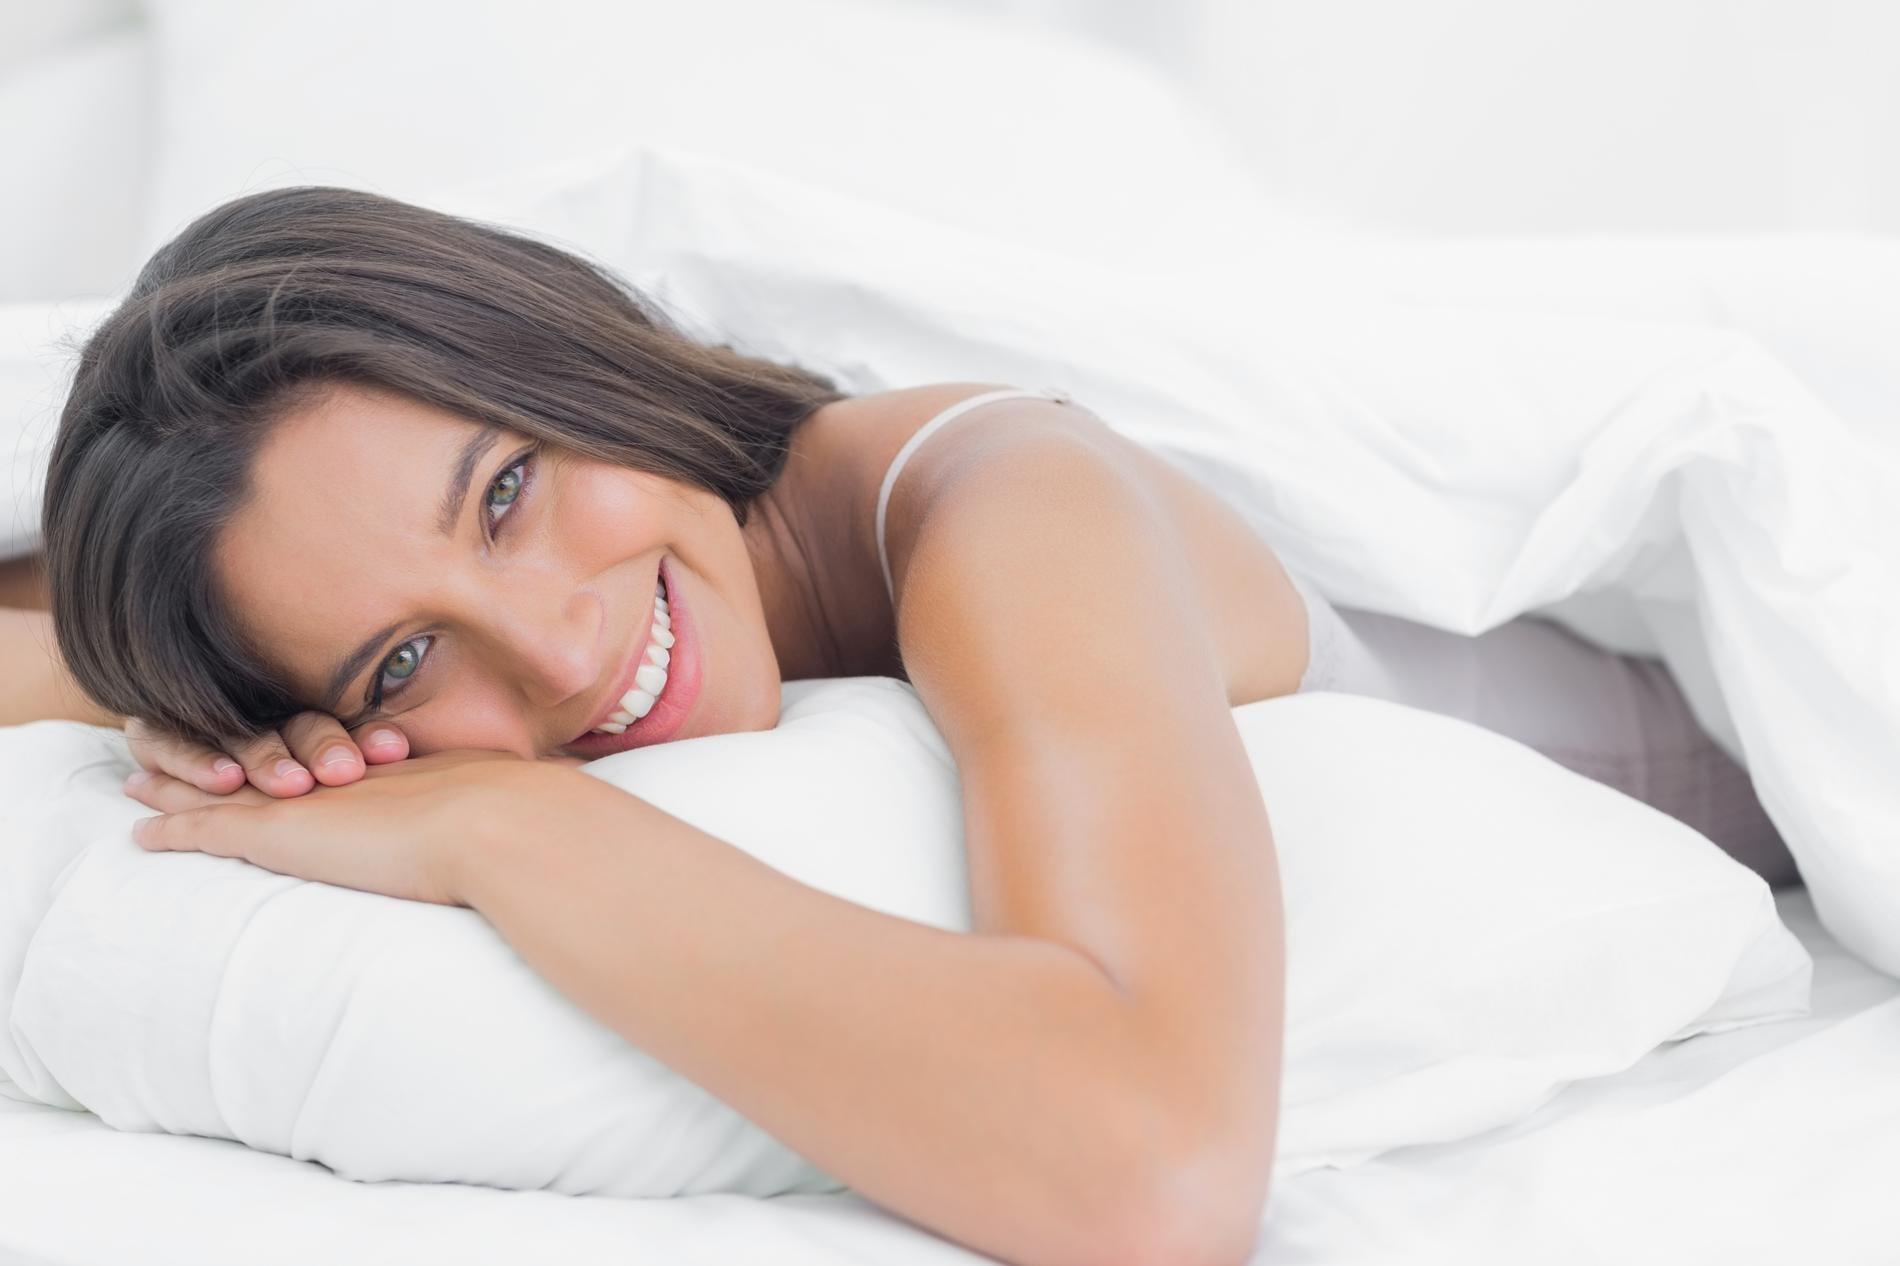 bien choisir son oreiller pour mieux dormir madame figaro. Black Bedroom Furniture Sets. Home Design Ideas